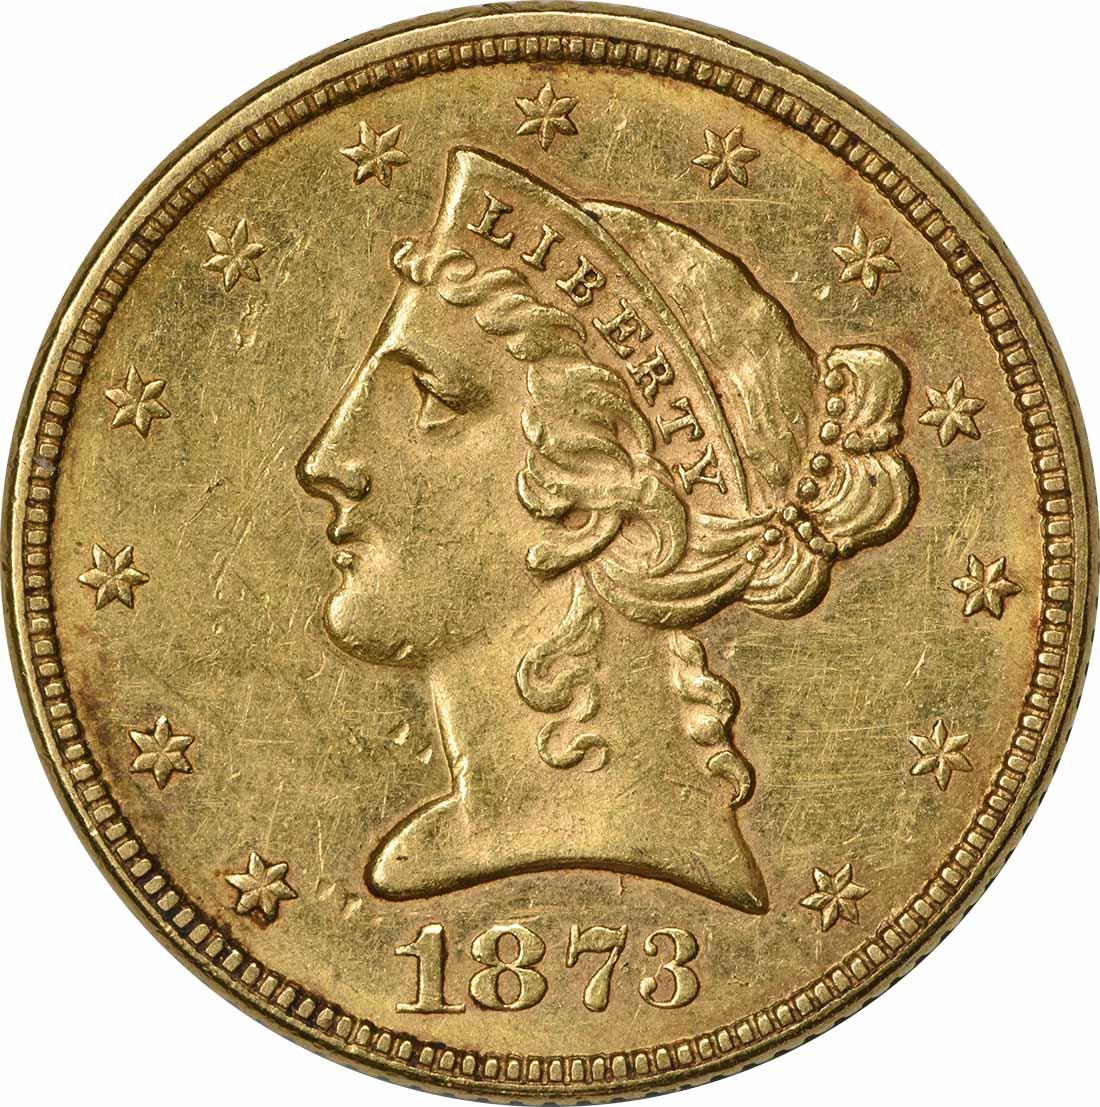 1873 $5 Gold Liberty Head Open 3 AU58 Uncertified